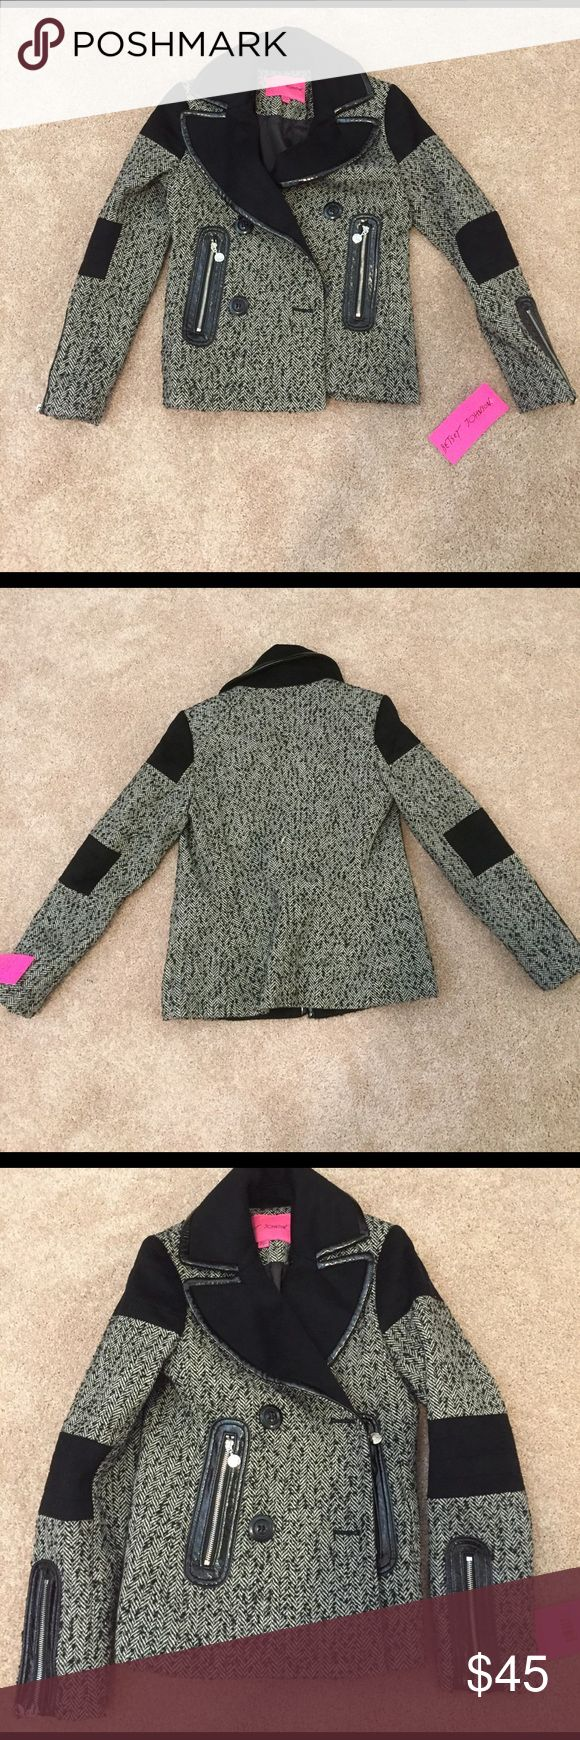 New Betsey Johnson pea coat Black and white wool, silver hard ware, fo leather trim Betsey Johnson Jackets & Coats Pea Coats